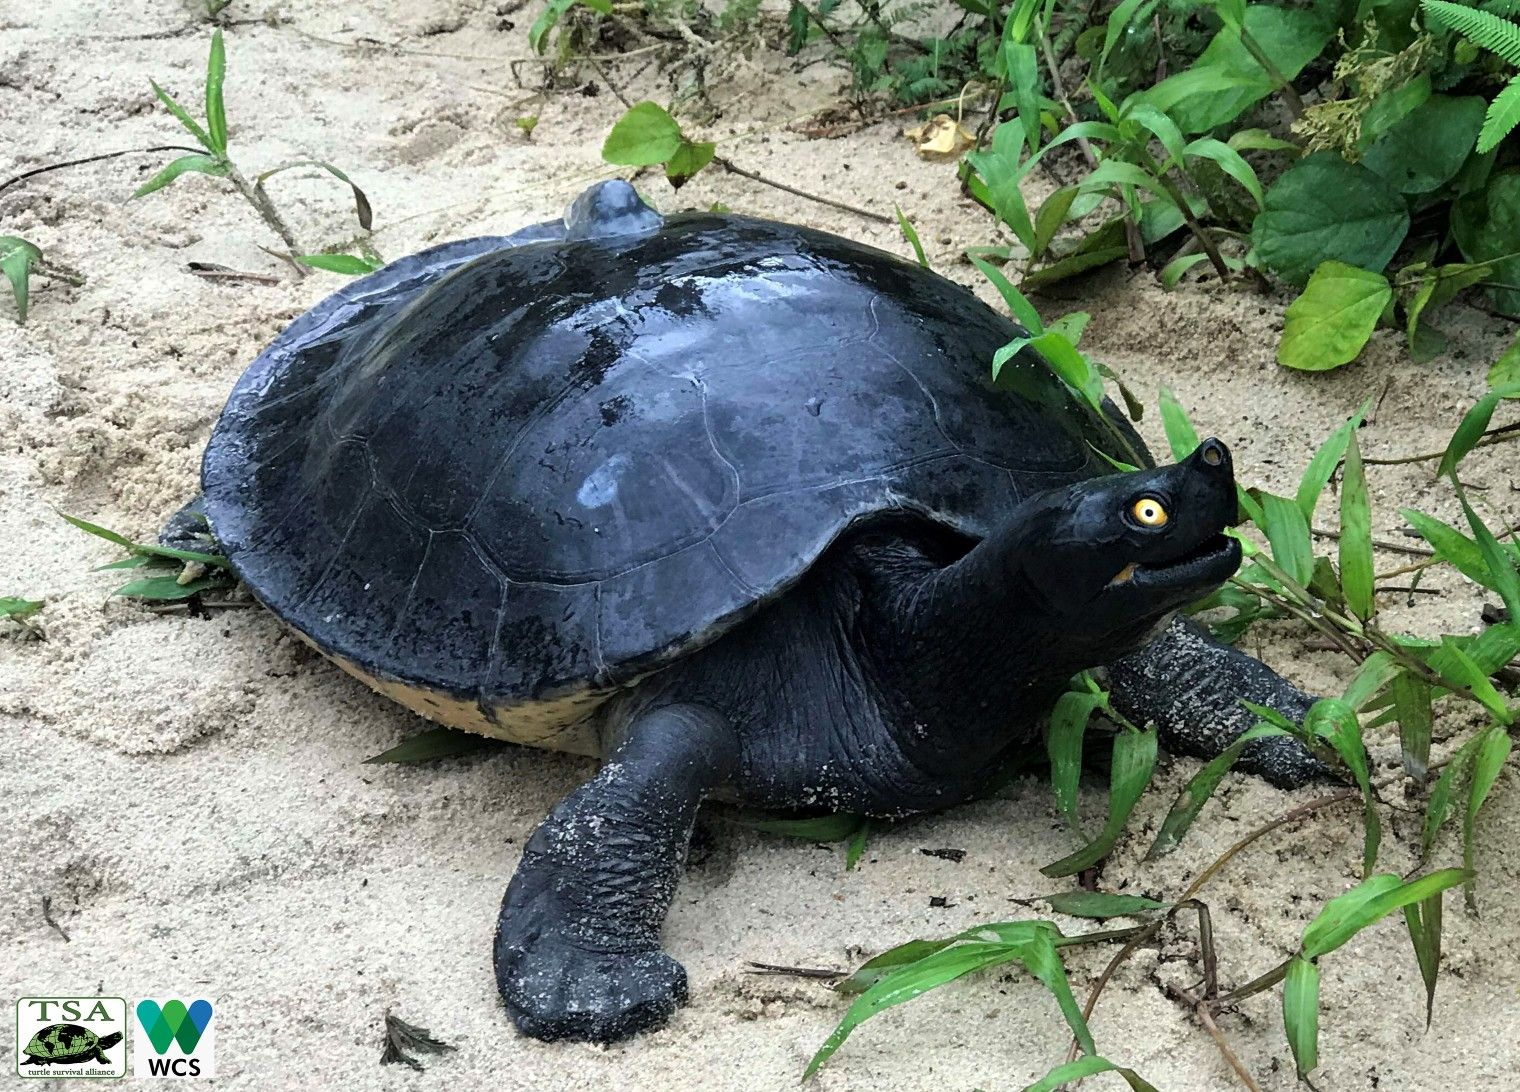 Southern River Terrapin Aquatic Turtles Tortoise Turtle